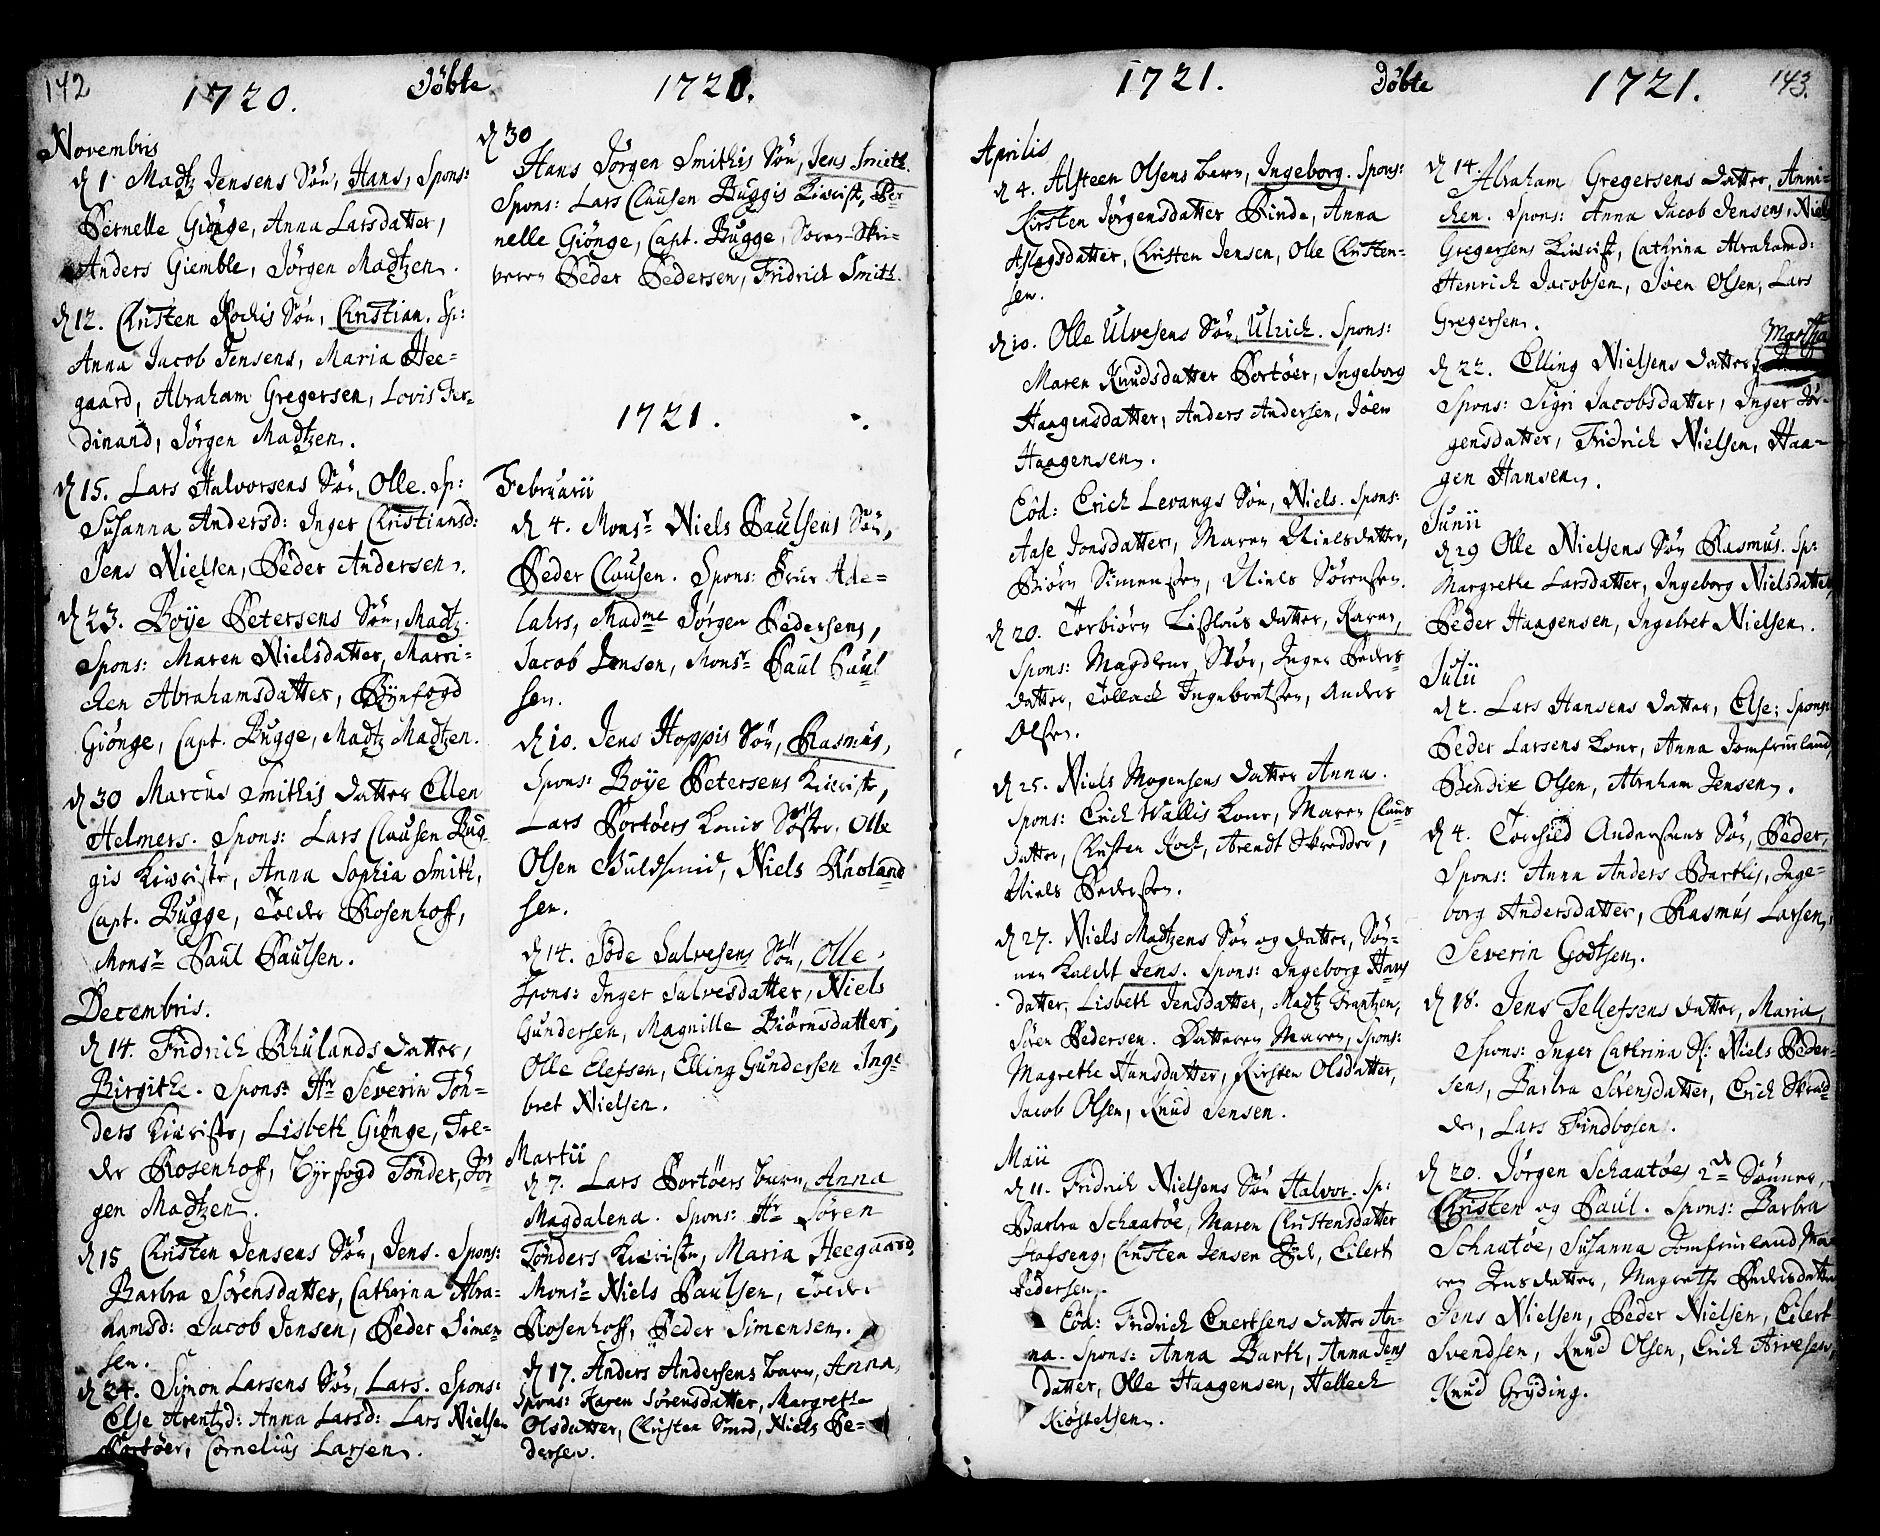 SAKO, Kragerø kirkebøker, F/Fa/L0001: Ministerialbok nr. 1, 1702-1766, s. 142-143